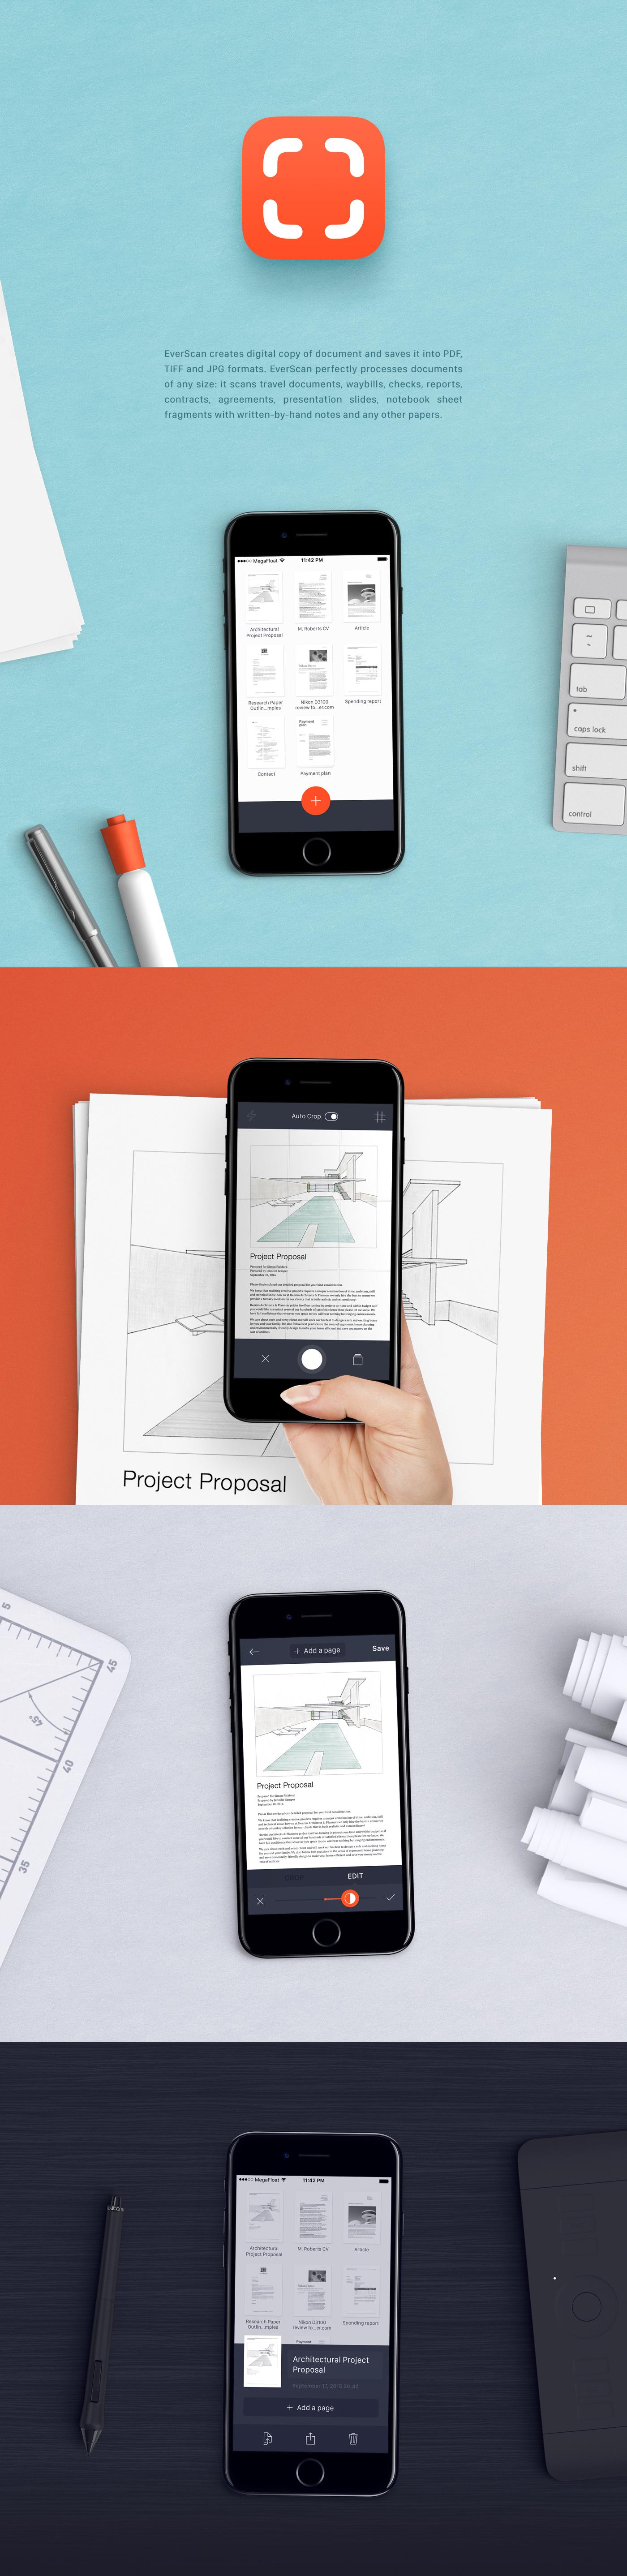 ios app scan iphone Iphone 7